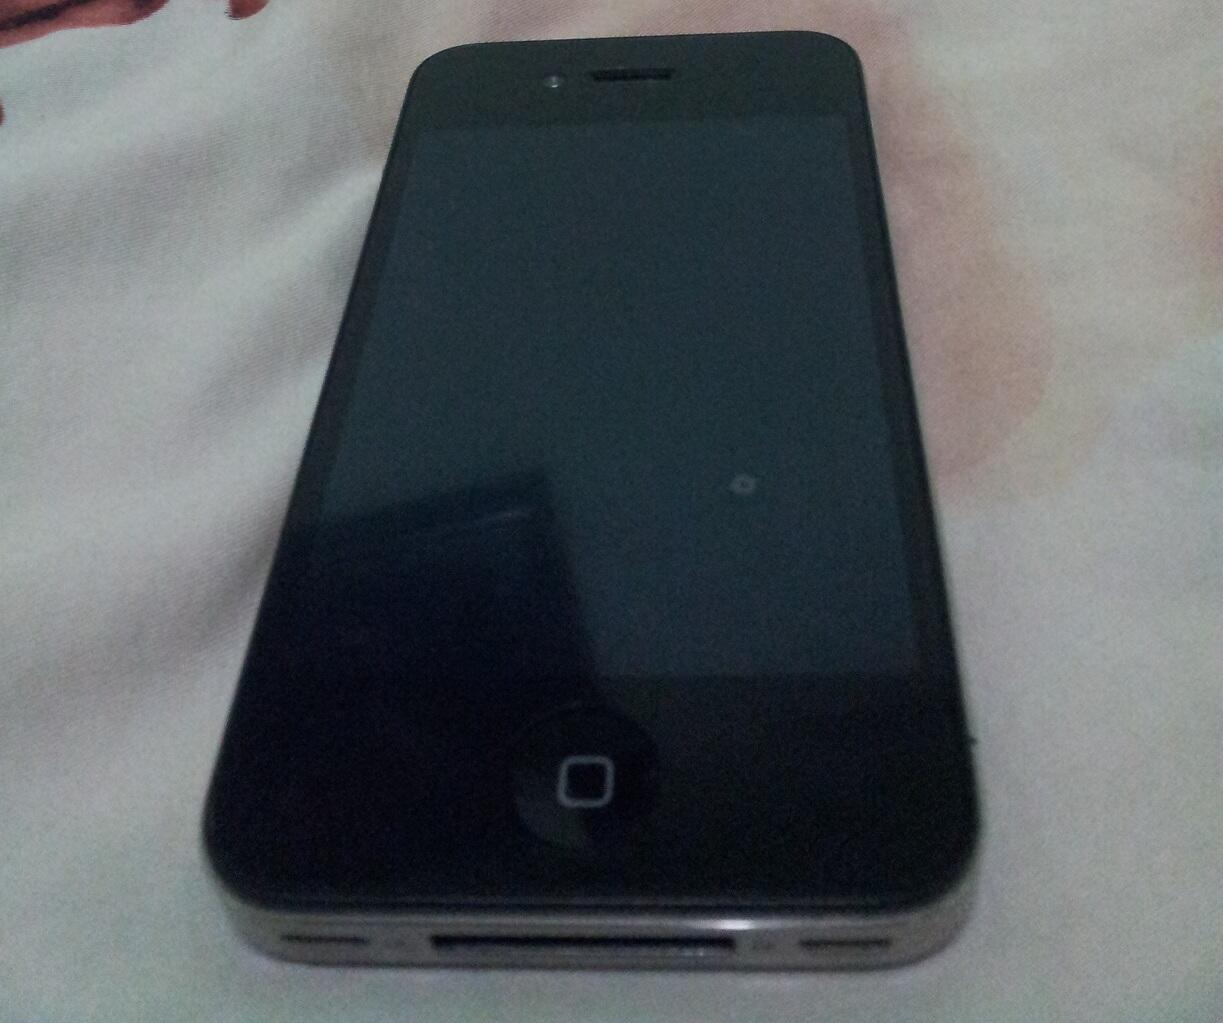 Iphone 4 Black 16GB super mulusss...